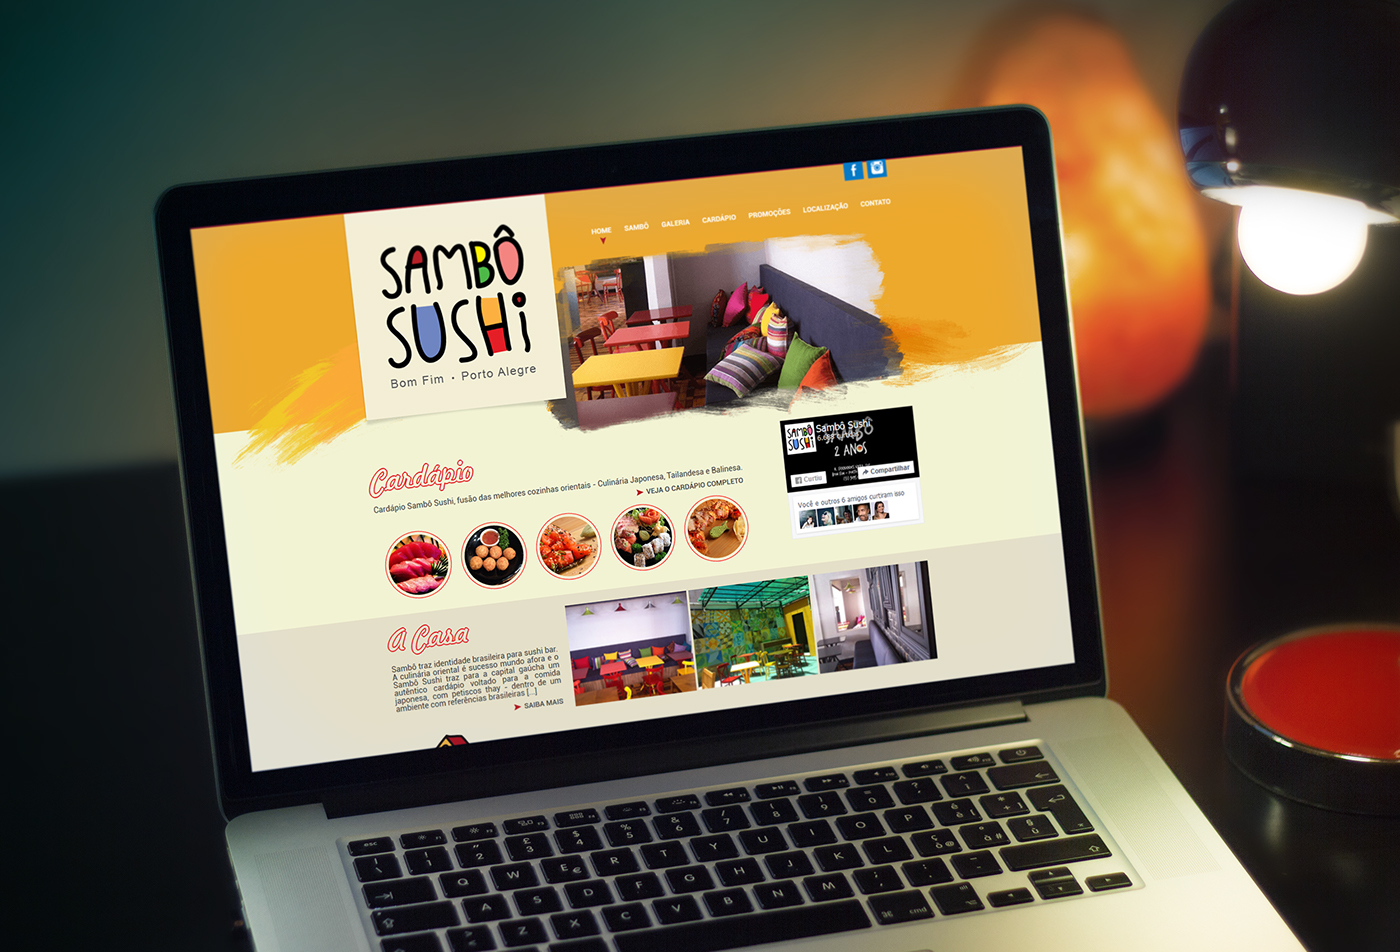 Sambo Sushi porto alegre cardápio restaurante restaurant menu Food  comida Brazil Website colors